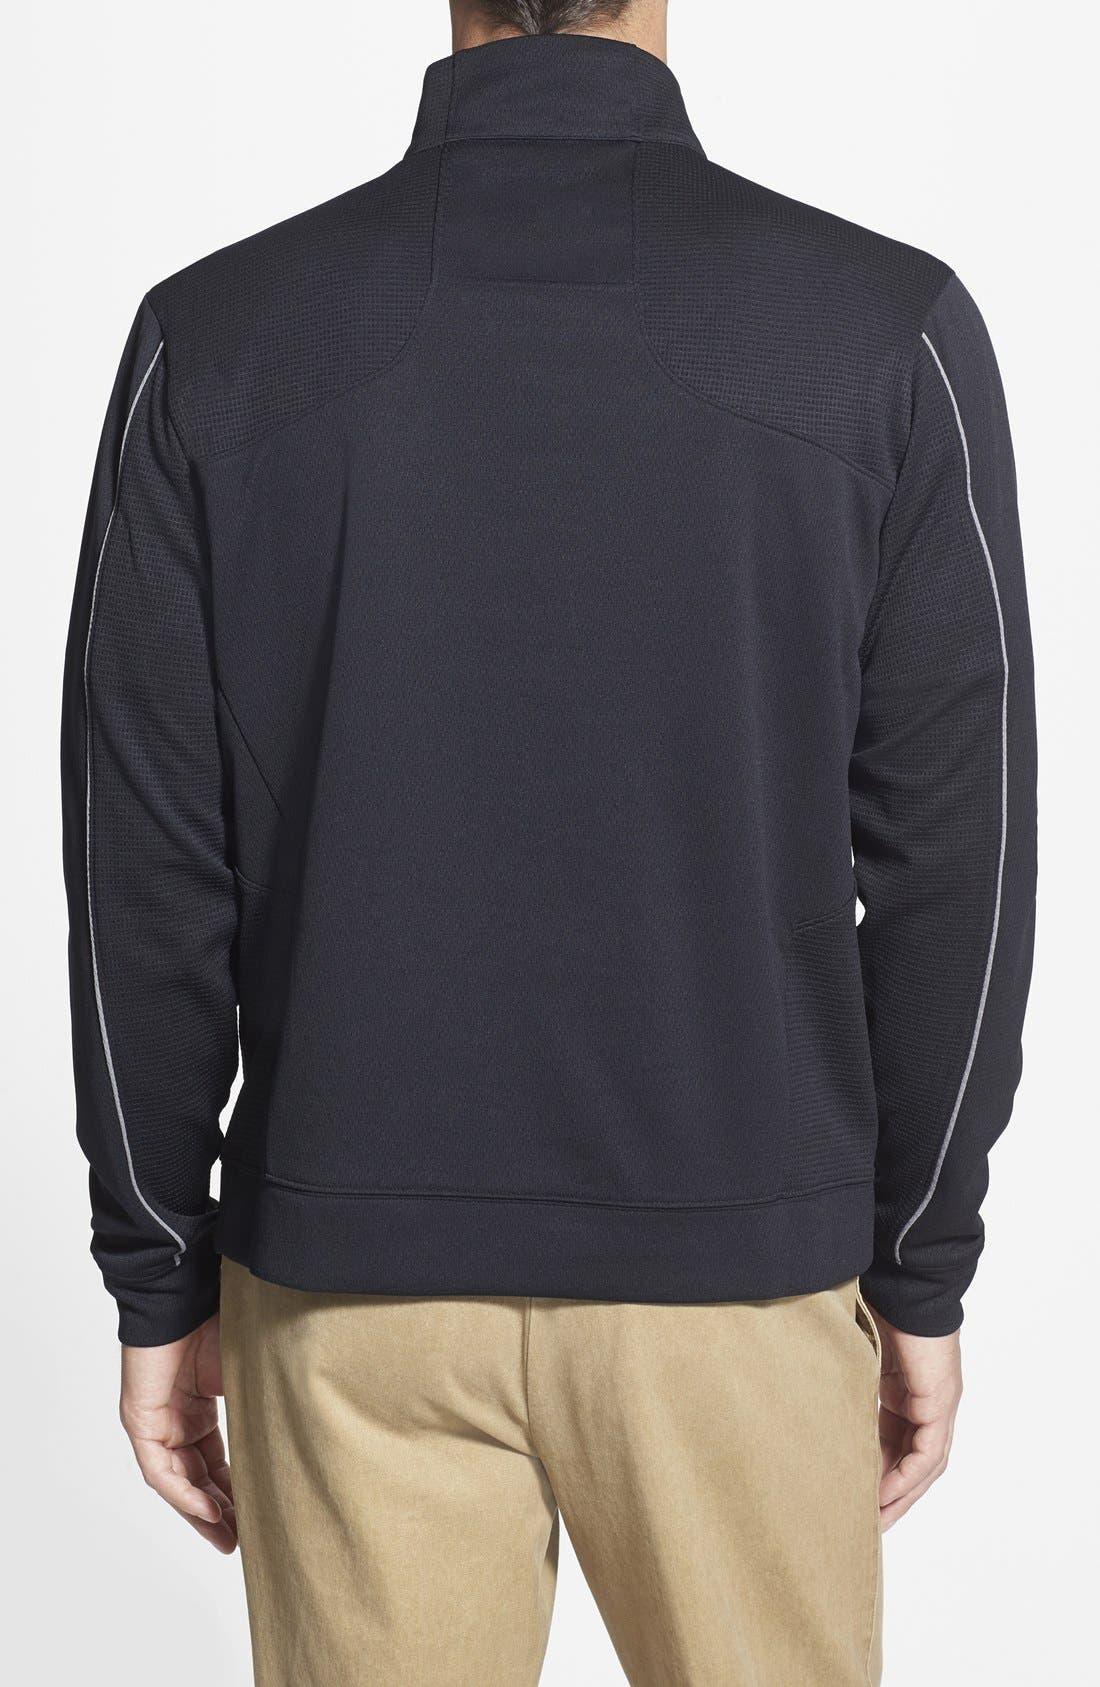 Cincinnati Bengals - Edge DryTec Moisture Wicking Half Zip Pullover,                             Alternate thumbnail 2, color,                             Black